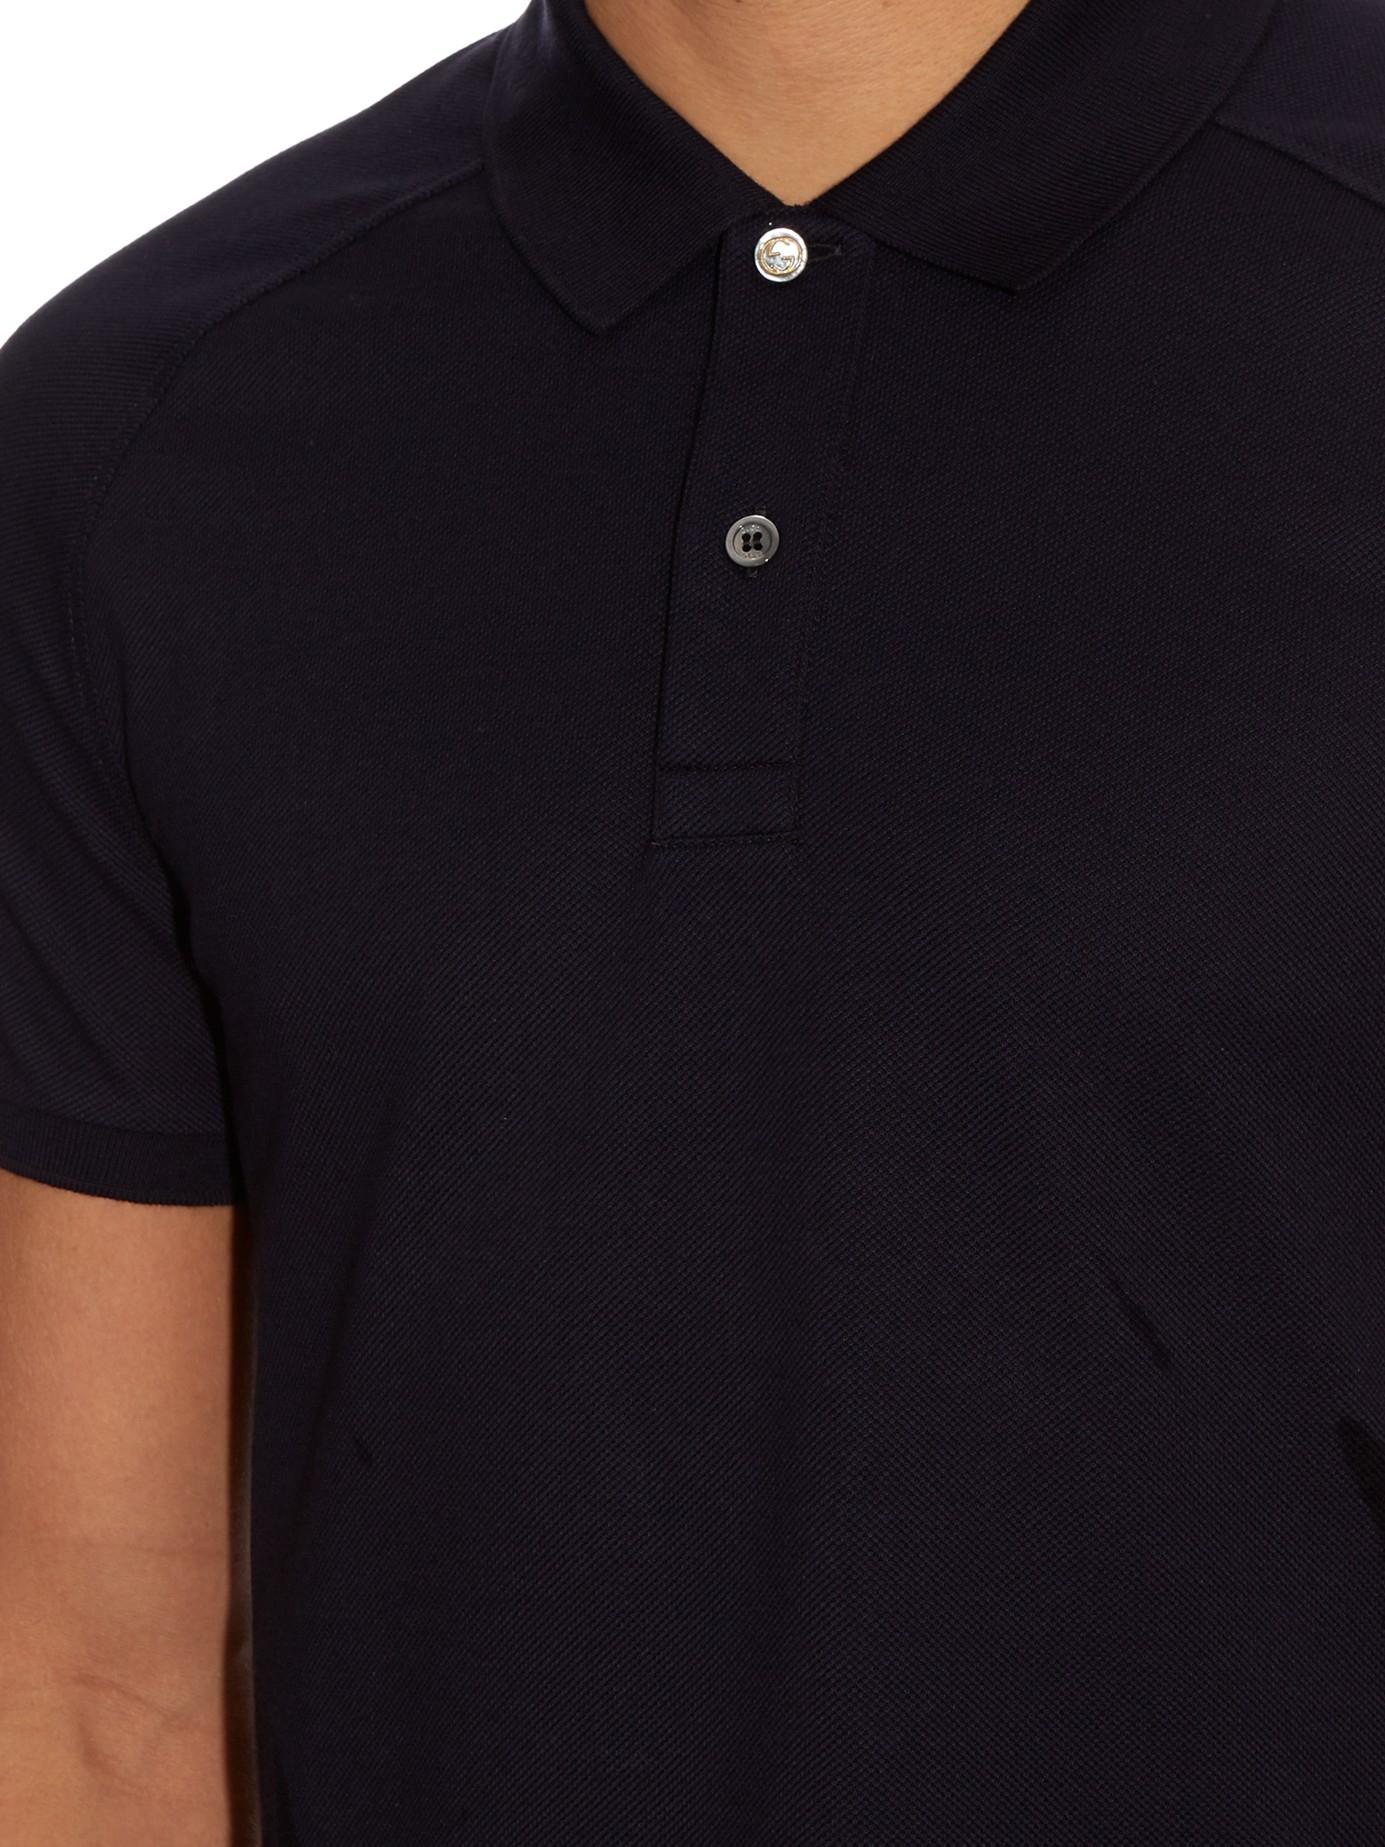 412d8811055 Gucci Snake-appliqué Cotton-blend Polo Shirt in Blue for Men - Lyst